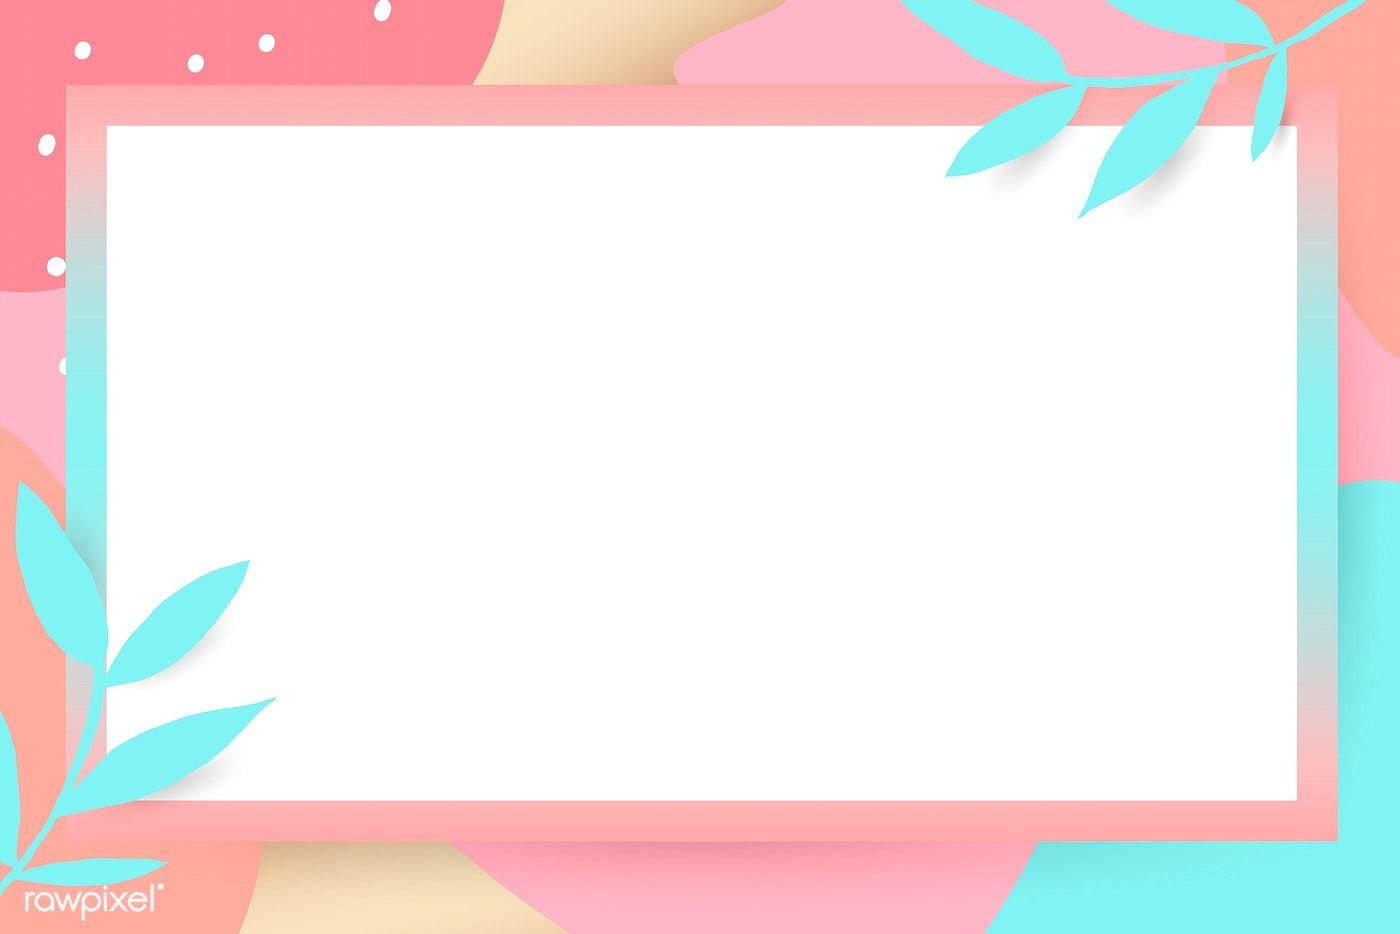 Download Premium Vector Of Rectangle Leafy Memphis Frame Vector 1217103 Wallpaper Powerpoint Powerpoint Background Design Flower Background Wallpaper